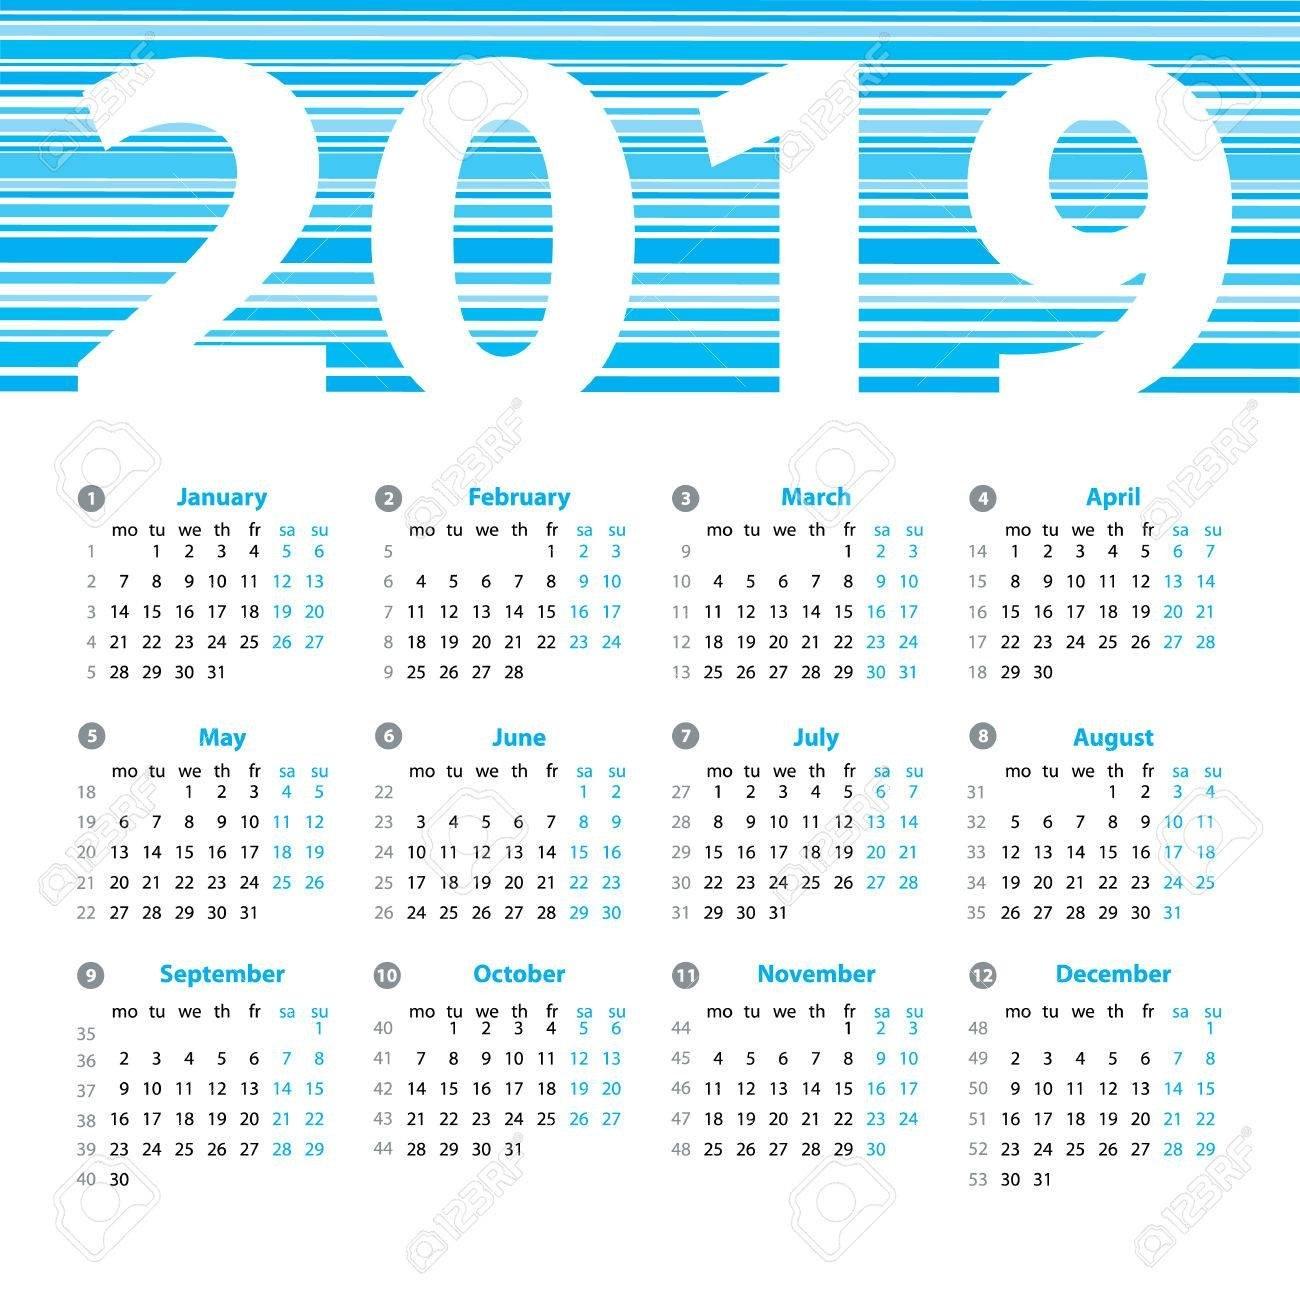 Calendar 2019 Year Vector Design Template With Week Numbers And Calendar Week 8 2019